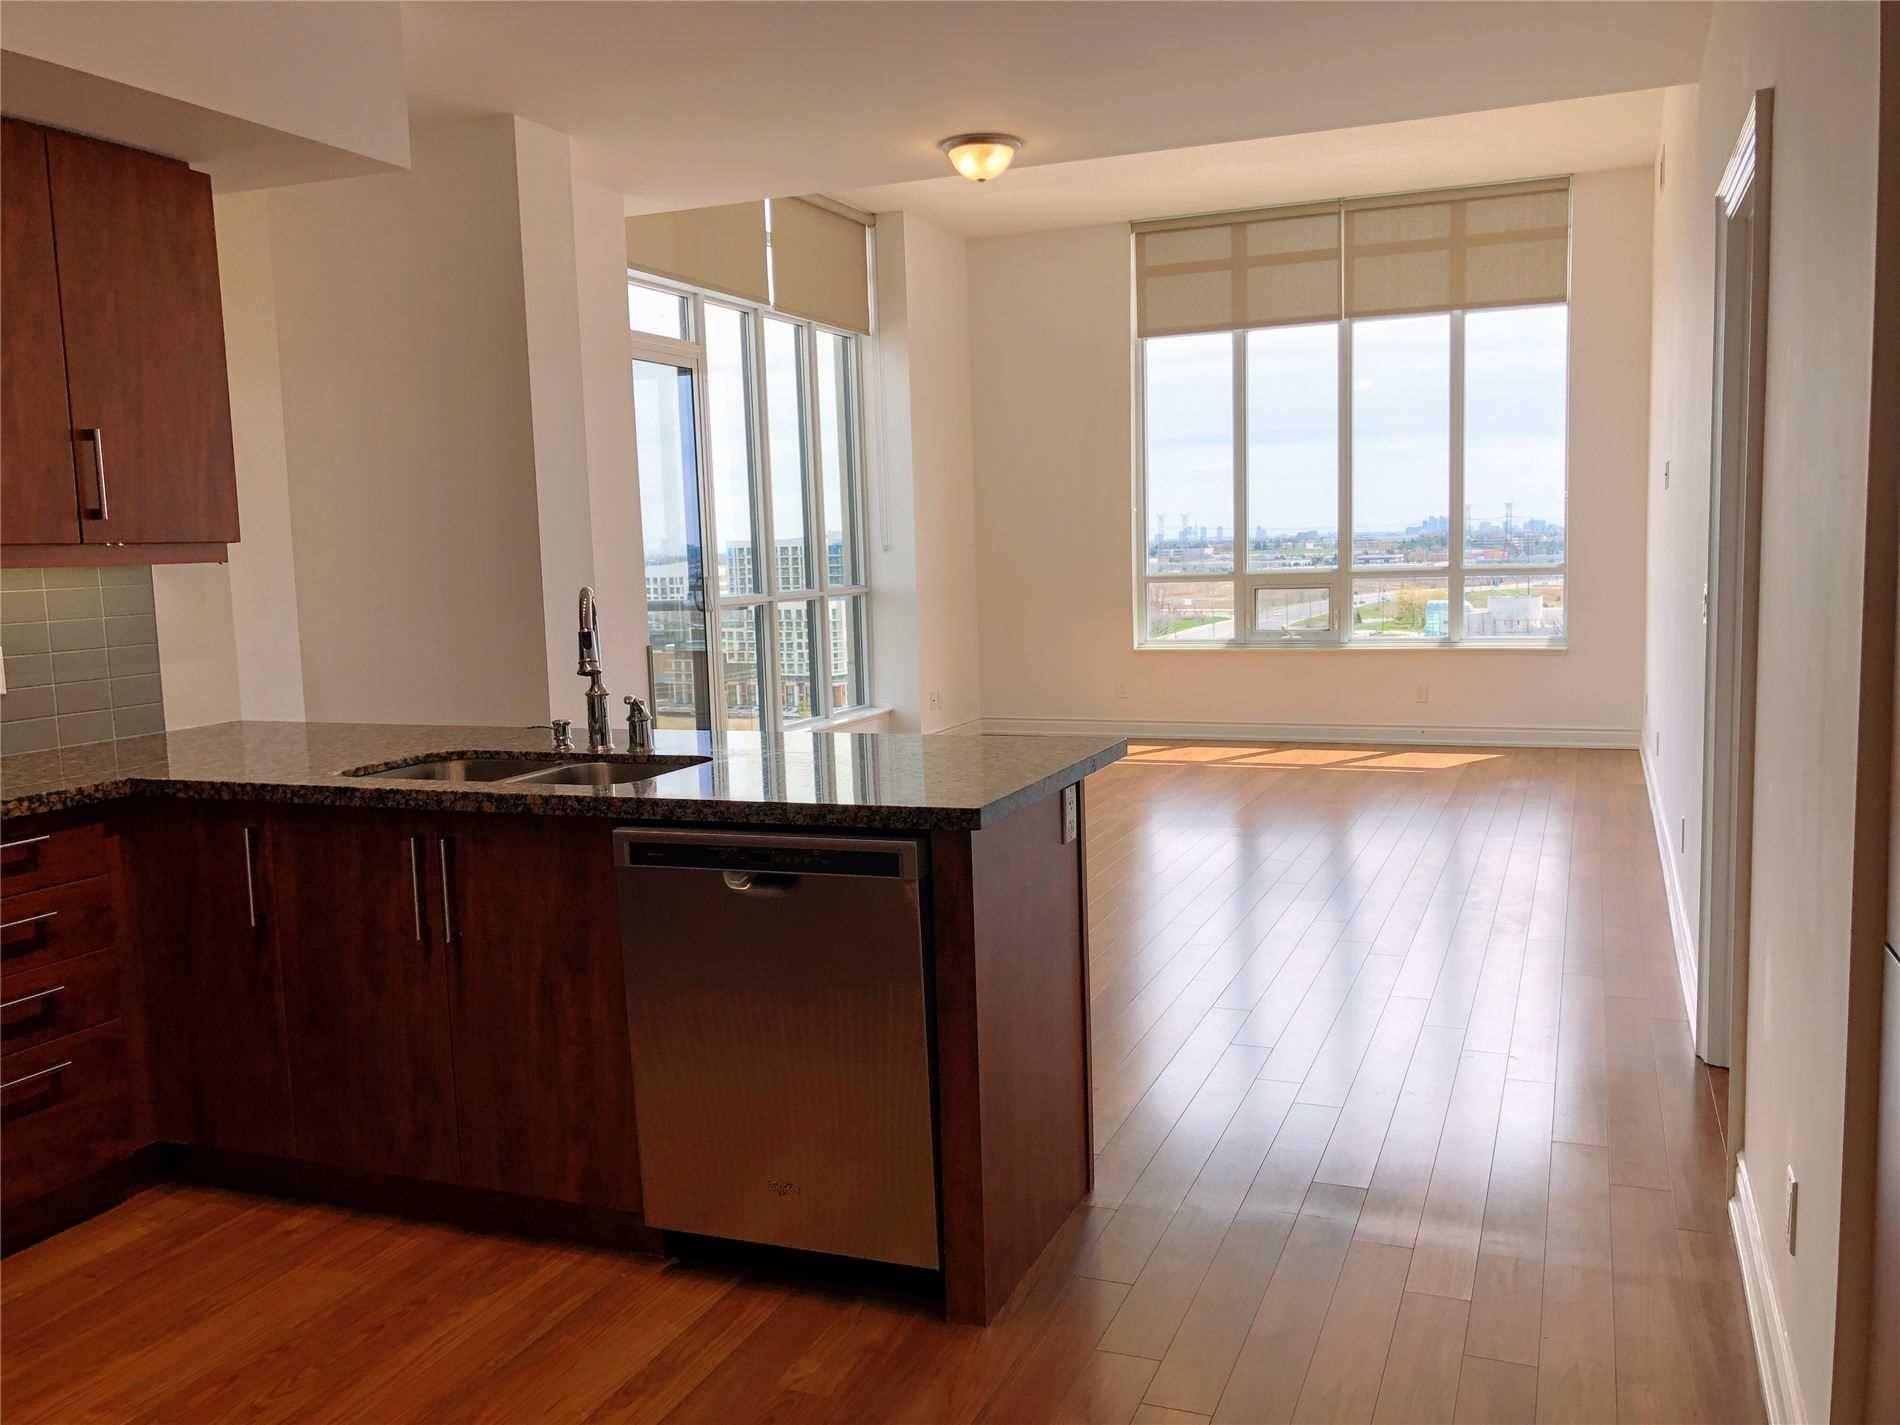 Apartment for rent at 38 Cedarland Dr Unit 1807 Markham Ontario - MLS: N4716419